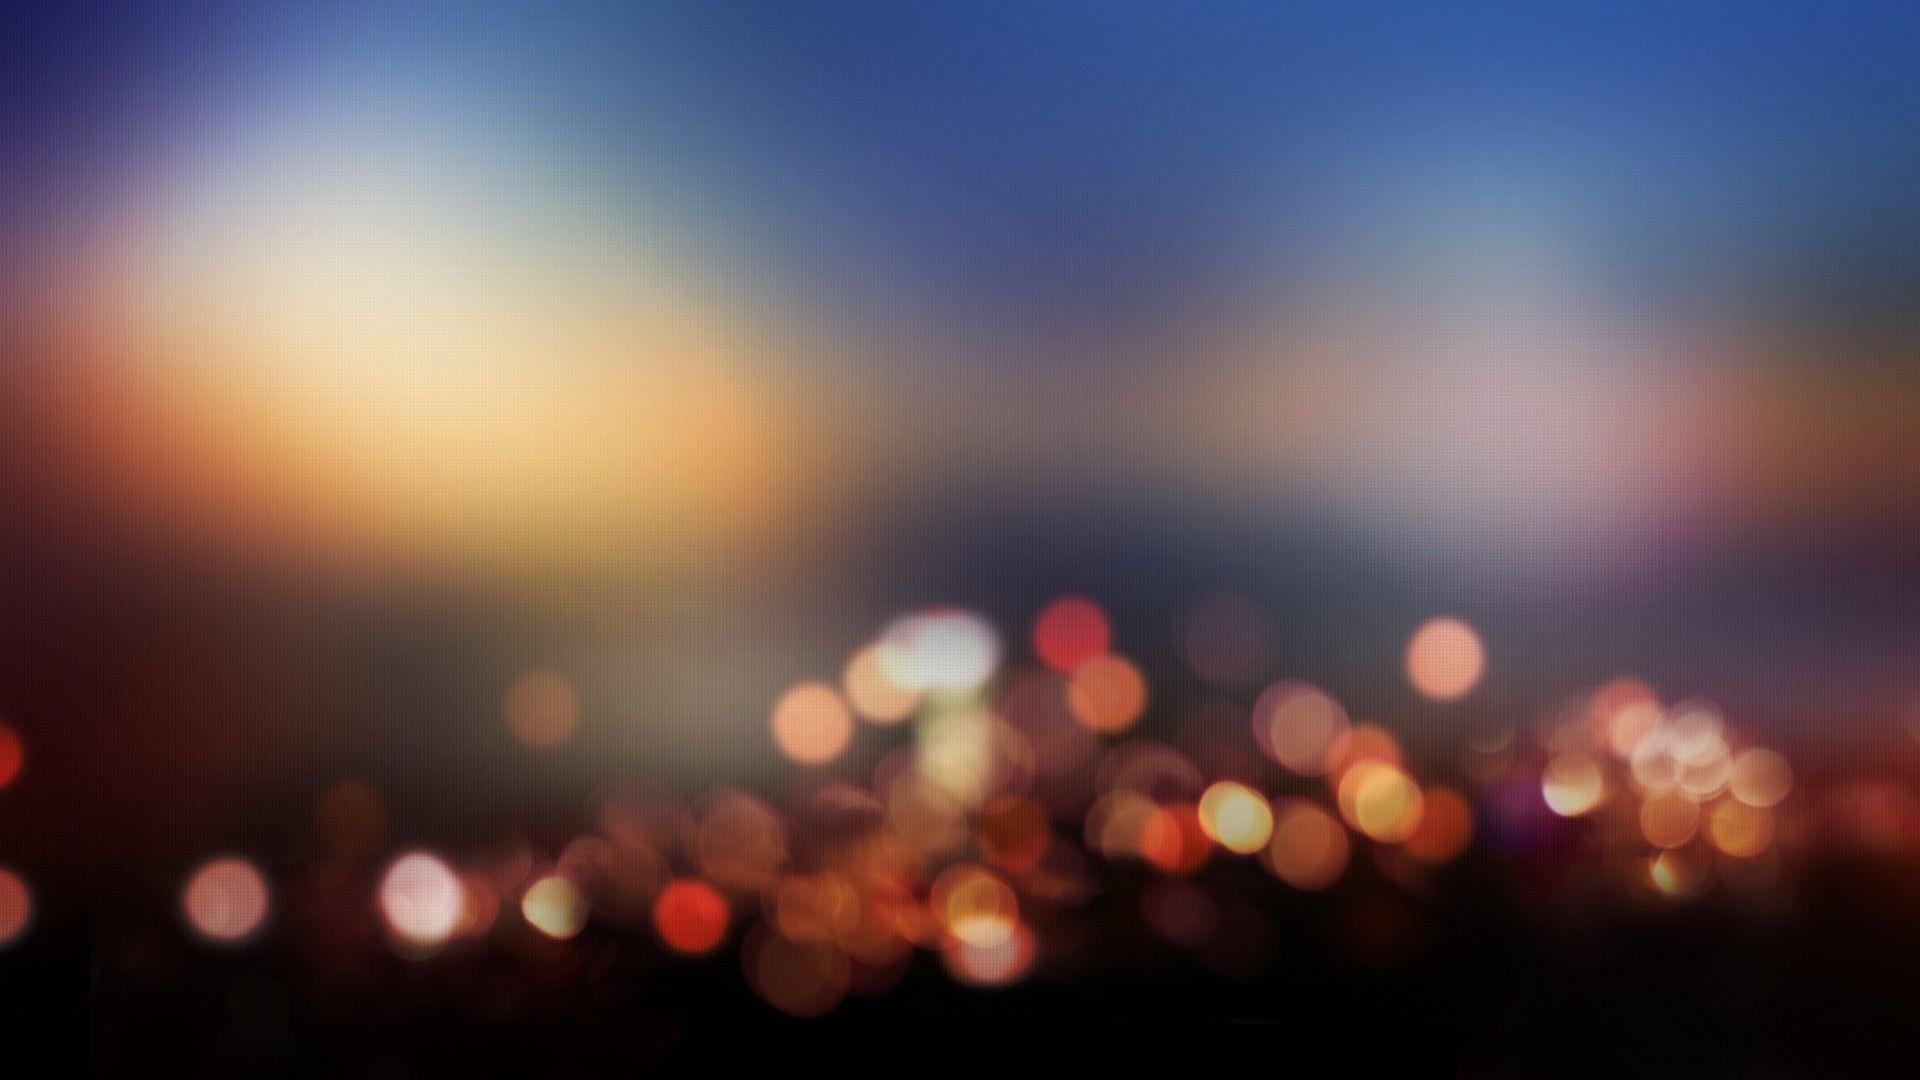 Blurred City Lights Wallpaper 7607